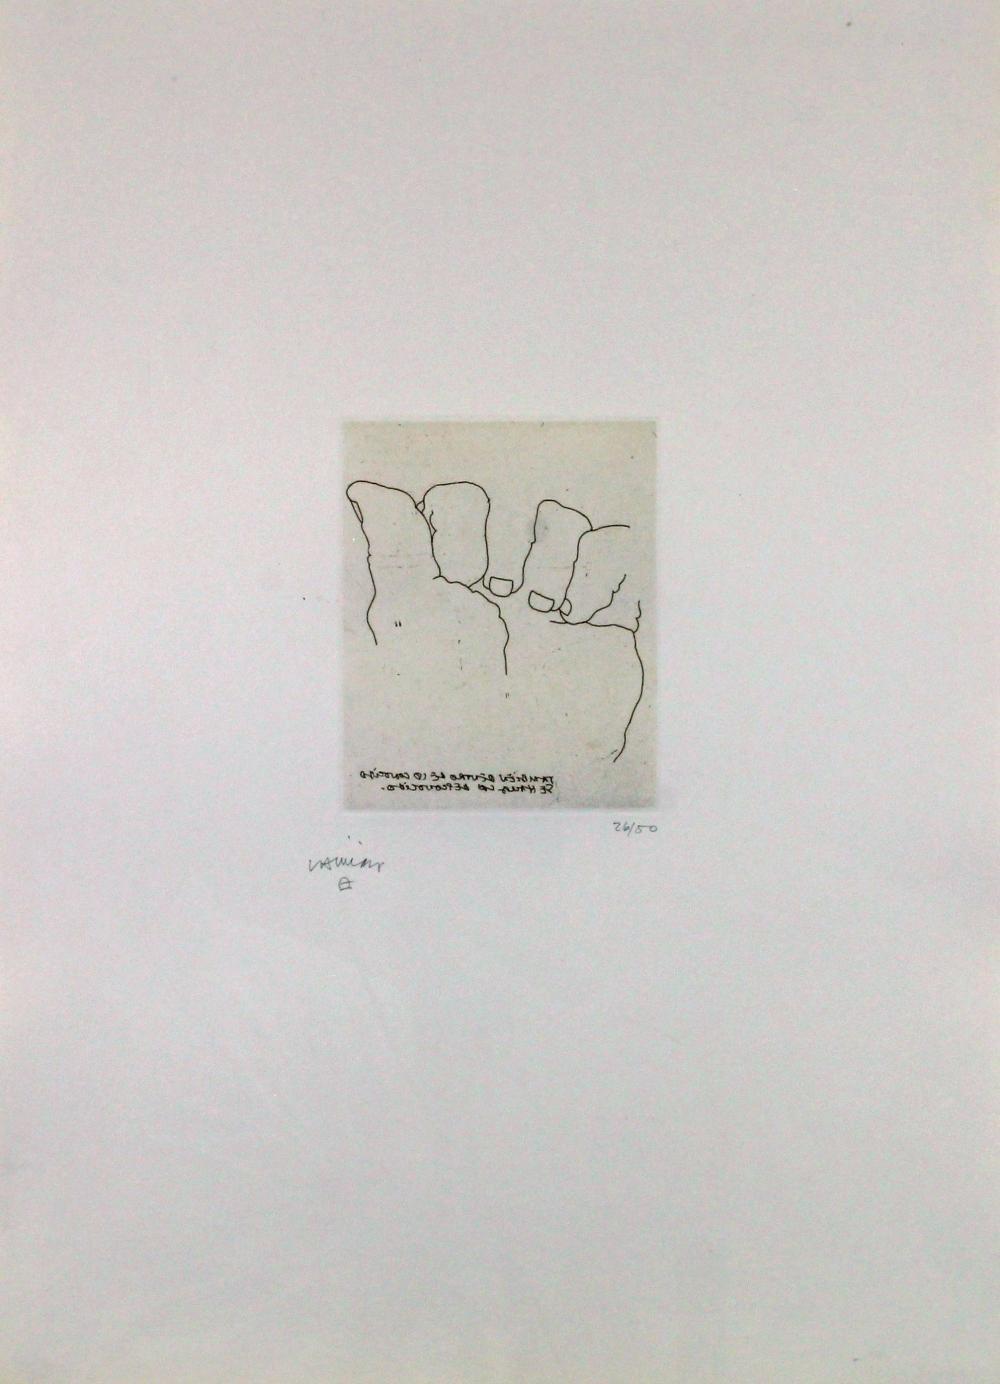 Chillida, Eduardo (San Sebastian 1924 - 2002 ebenda, Studium an der KA Madrid und am Círculo de Bellas Artes in Madrid, in Frankreich und Spanien tätiger Künstler),